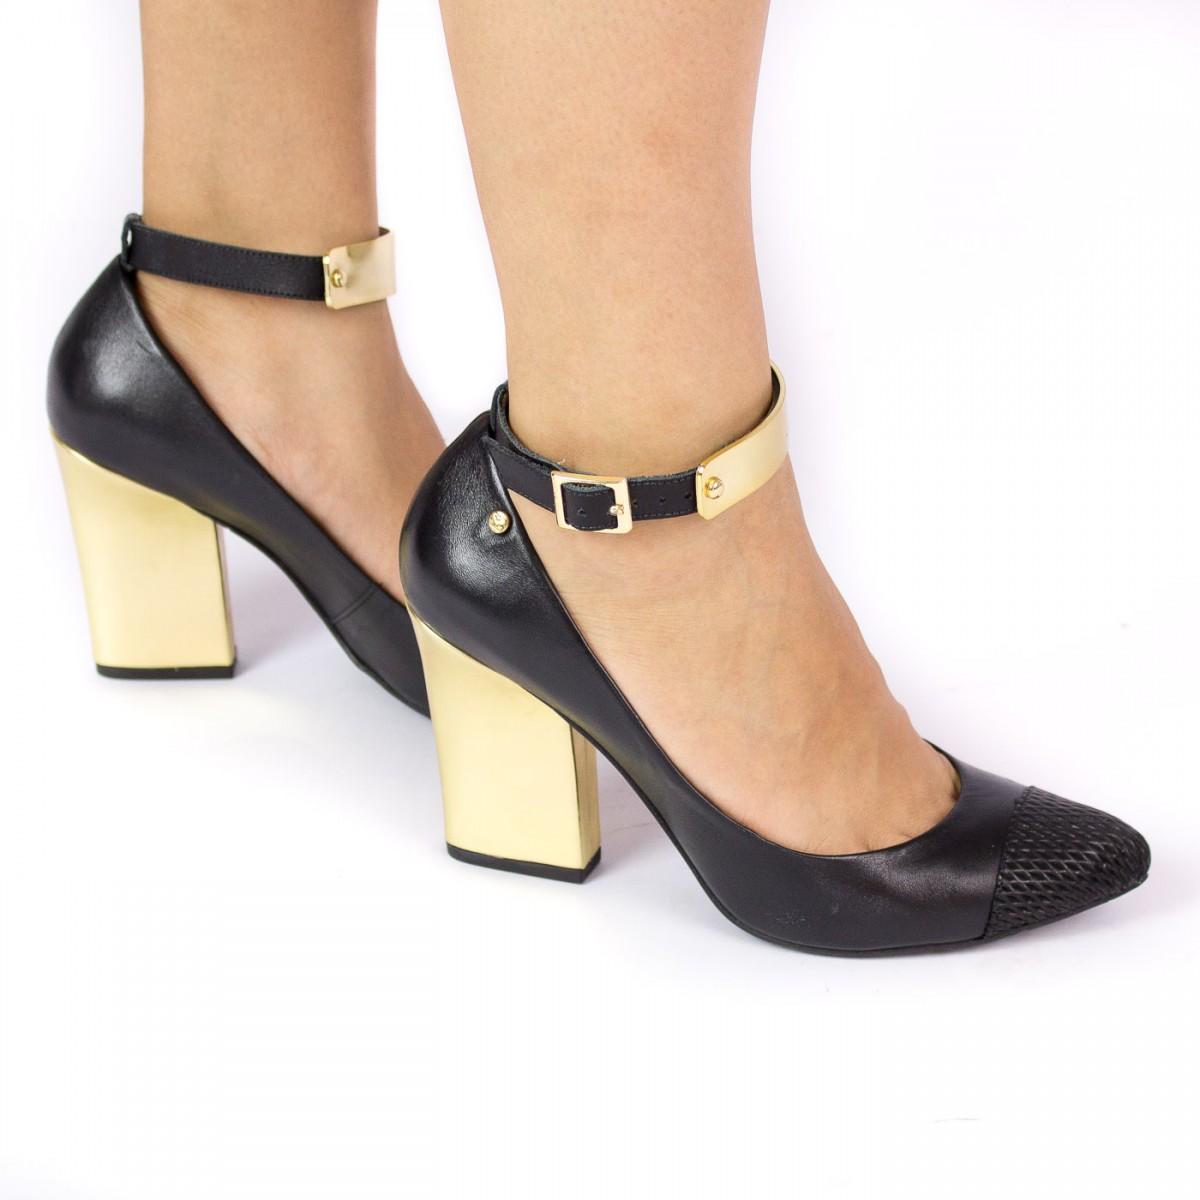 26734d001 Bizz Store - Sapato Feminino Lillys Closet Sabrina Sato Preto